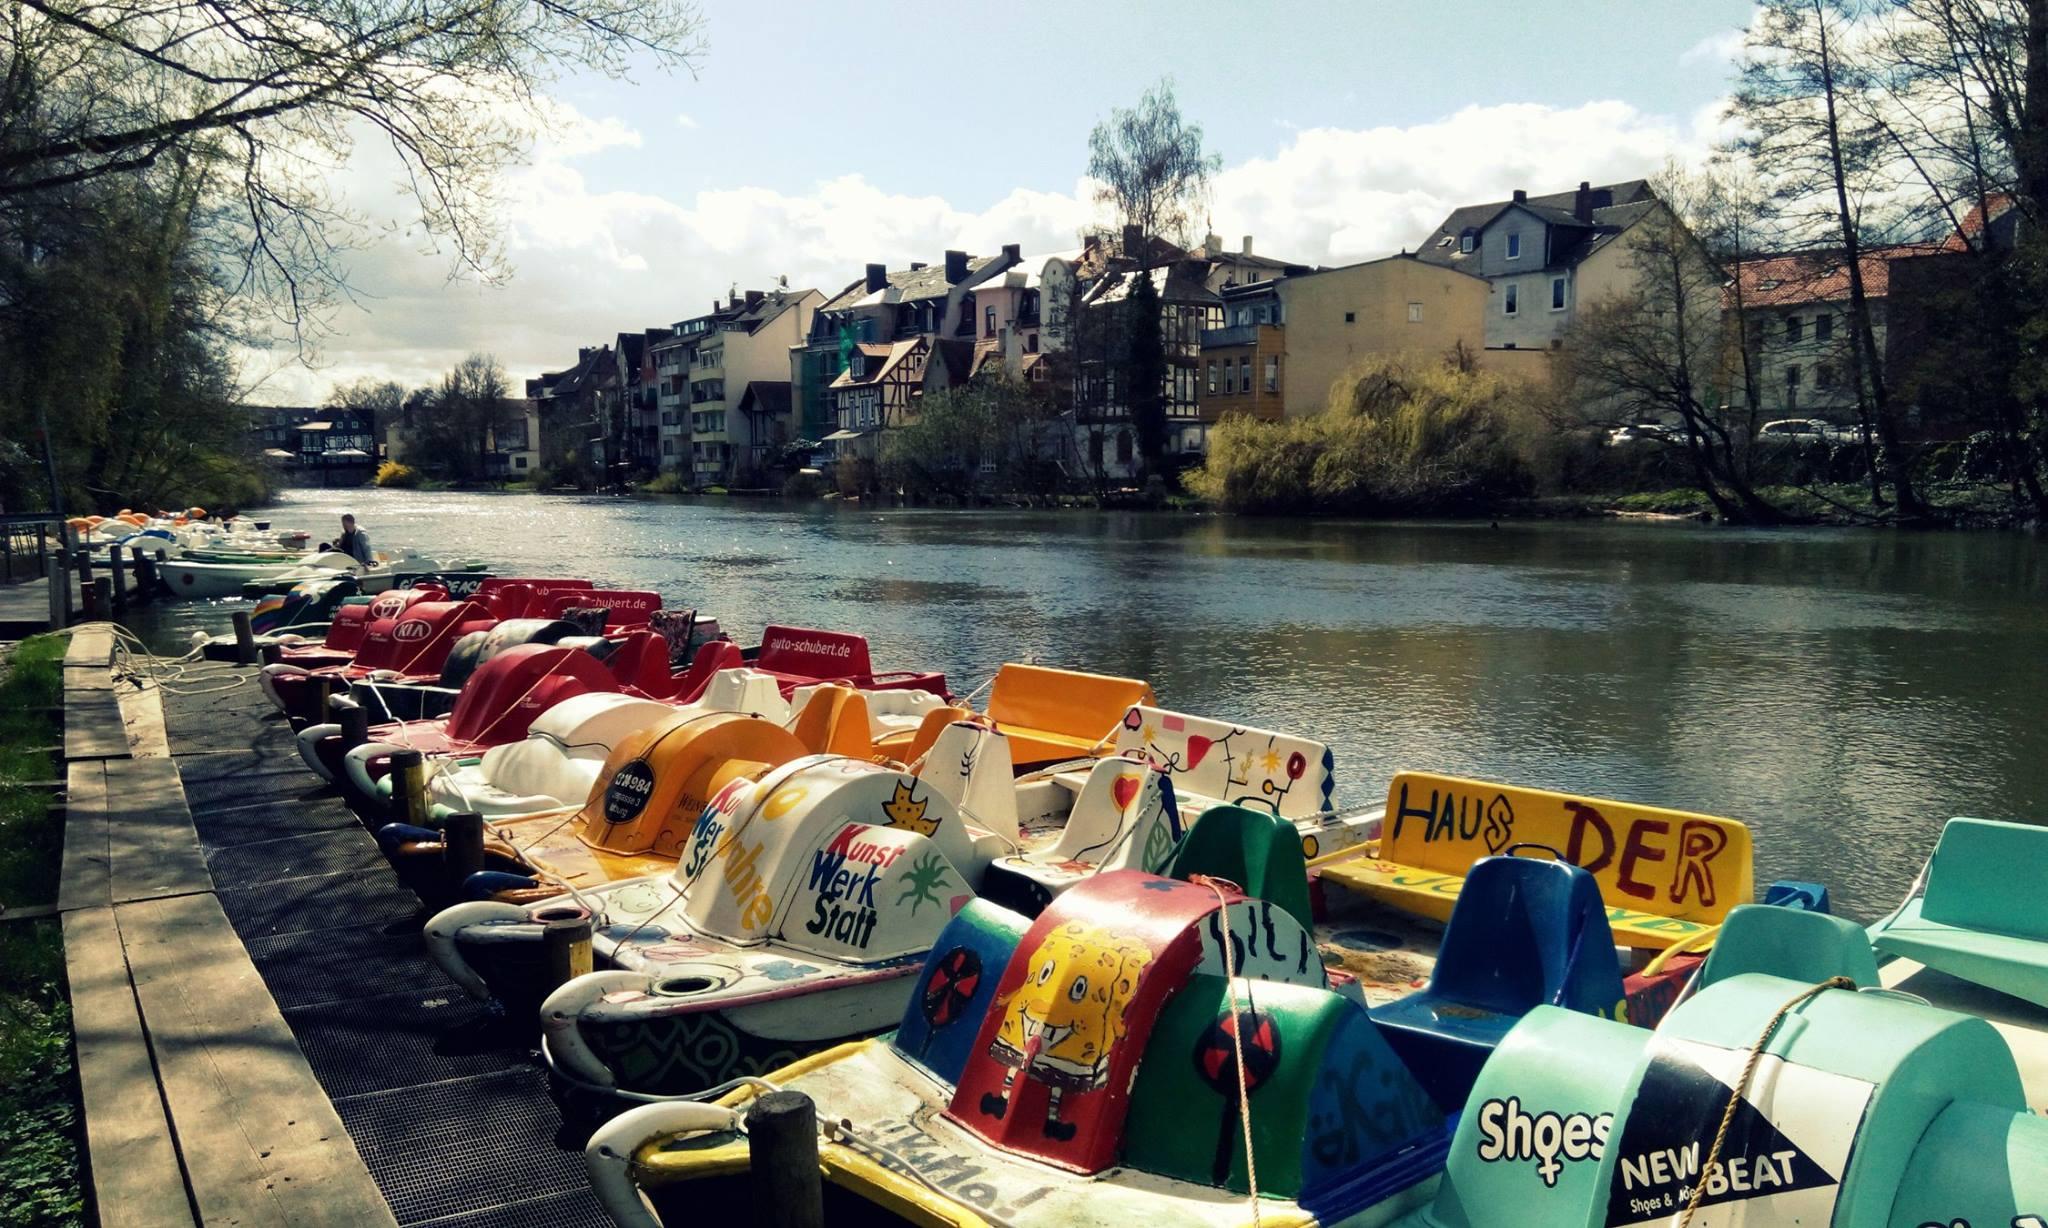 tretboot fahren berlin